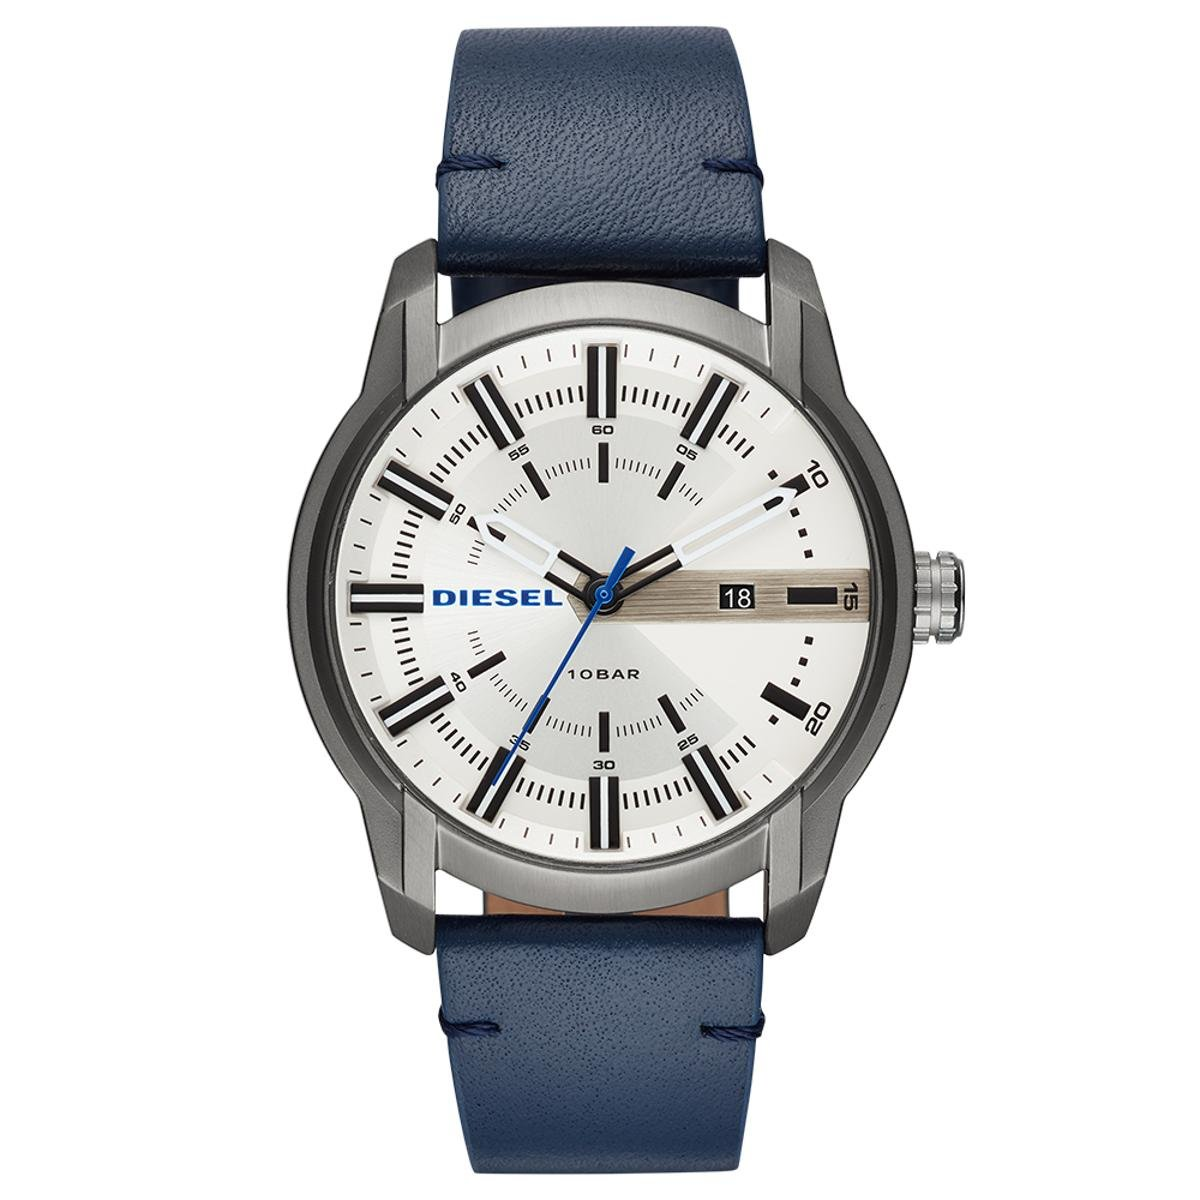 c609d6ff3f4 Relógio Diesel Masculino Armbar - DZ1866 0AN DZ1866 0AN - Azul - Compre  Agora